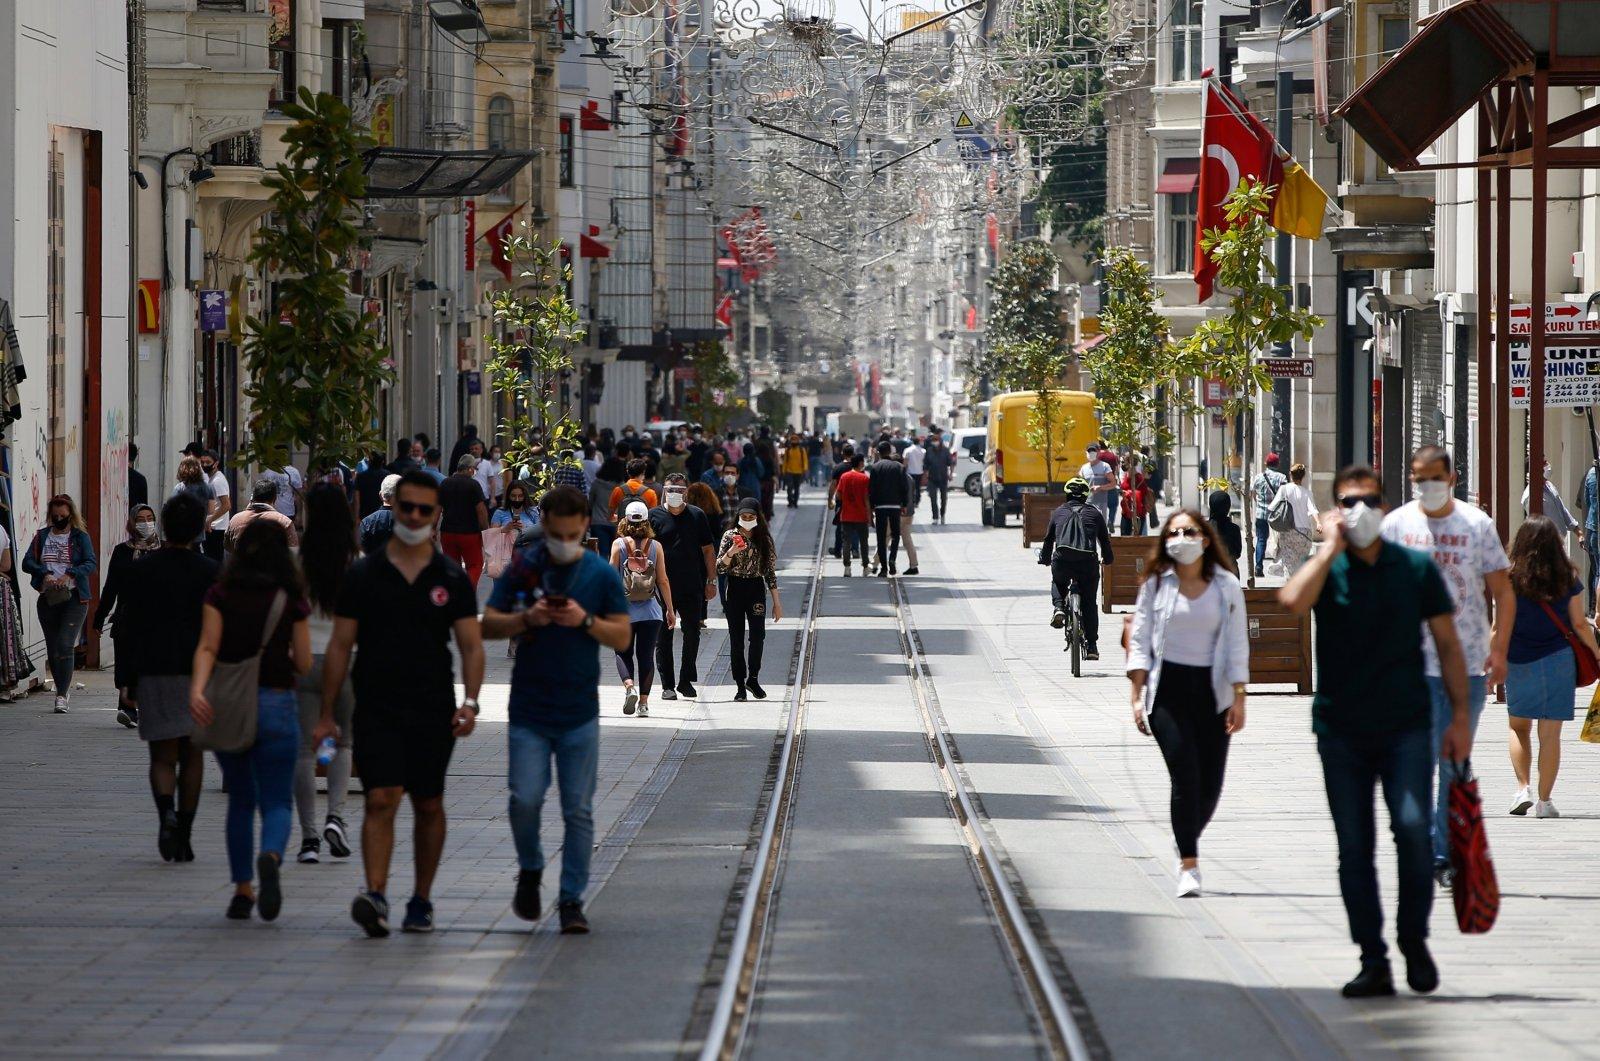 People walk along Istiklal Street near Taksim Square, Istanbul, Turkey, May 15, 2020. (AP File Photo)